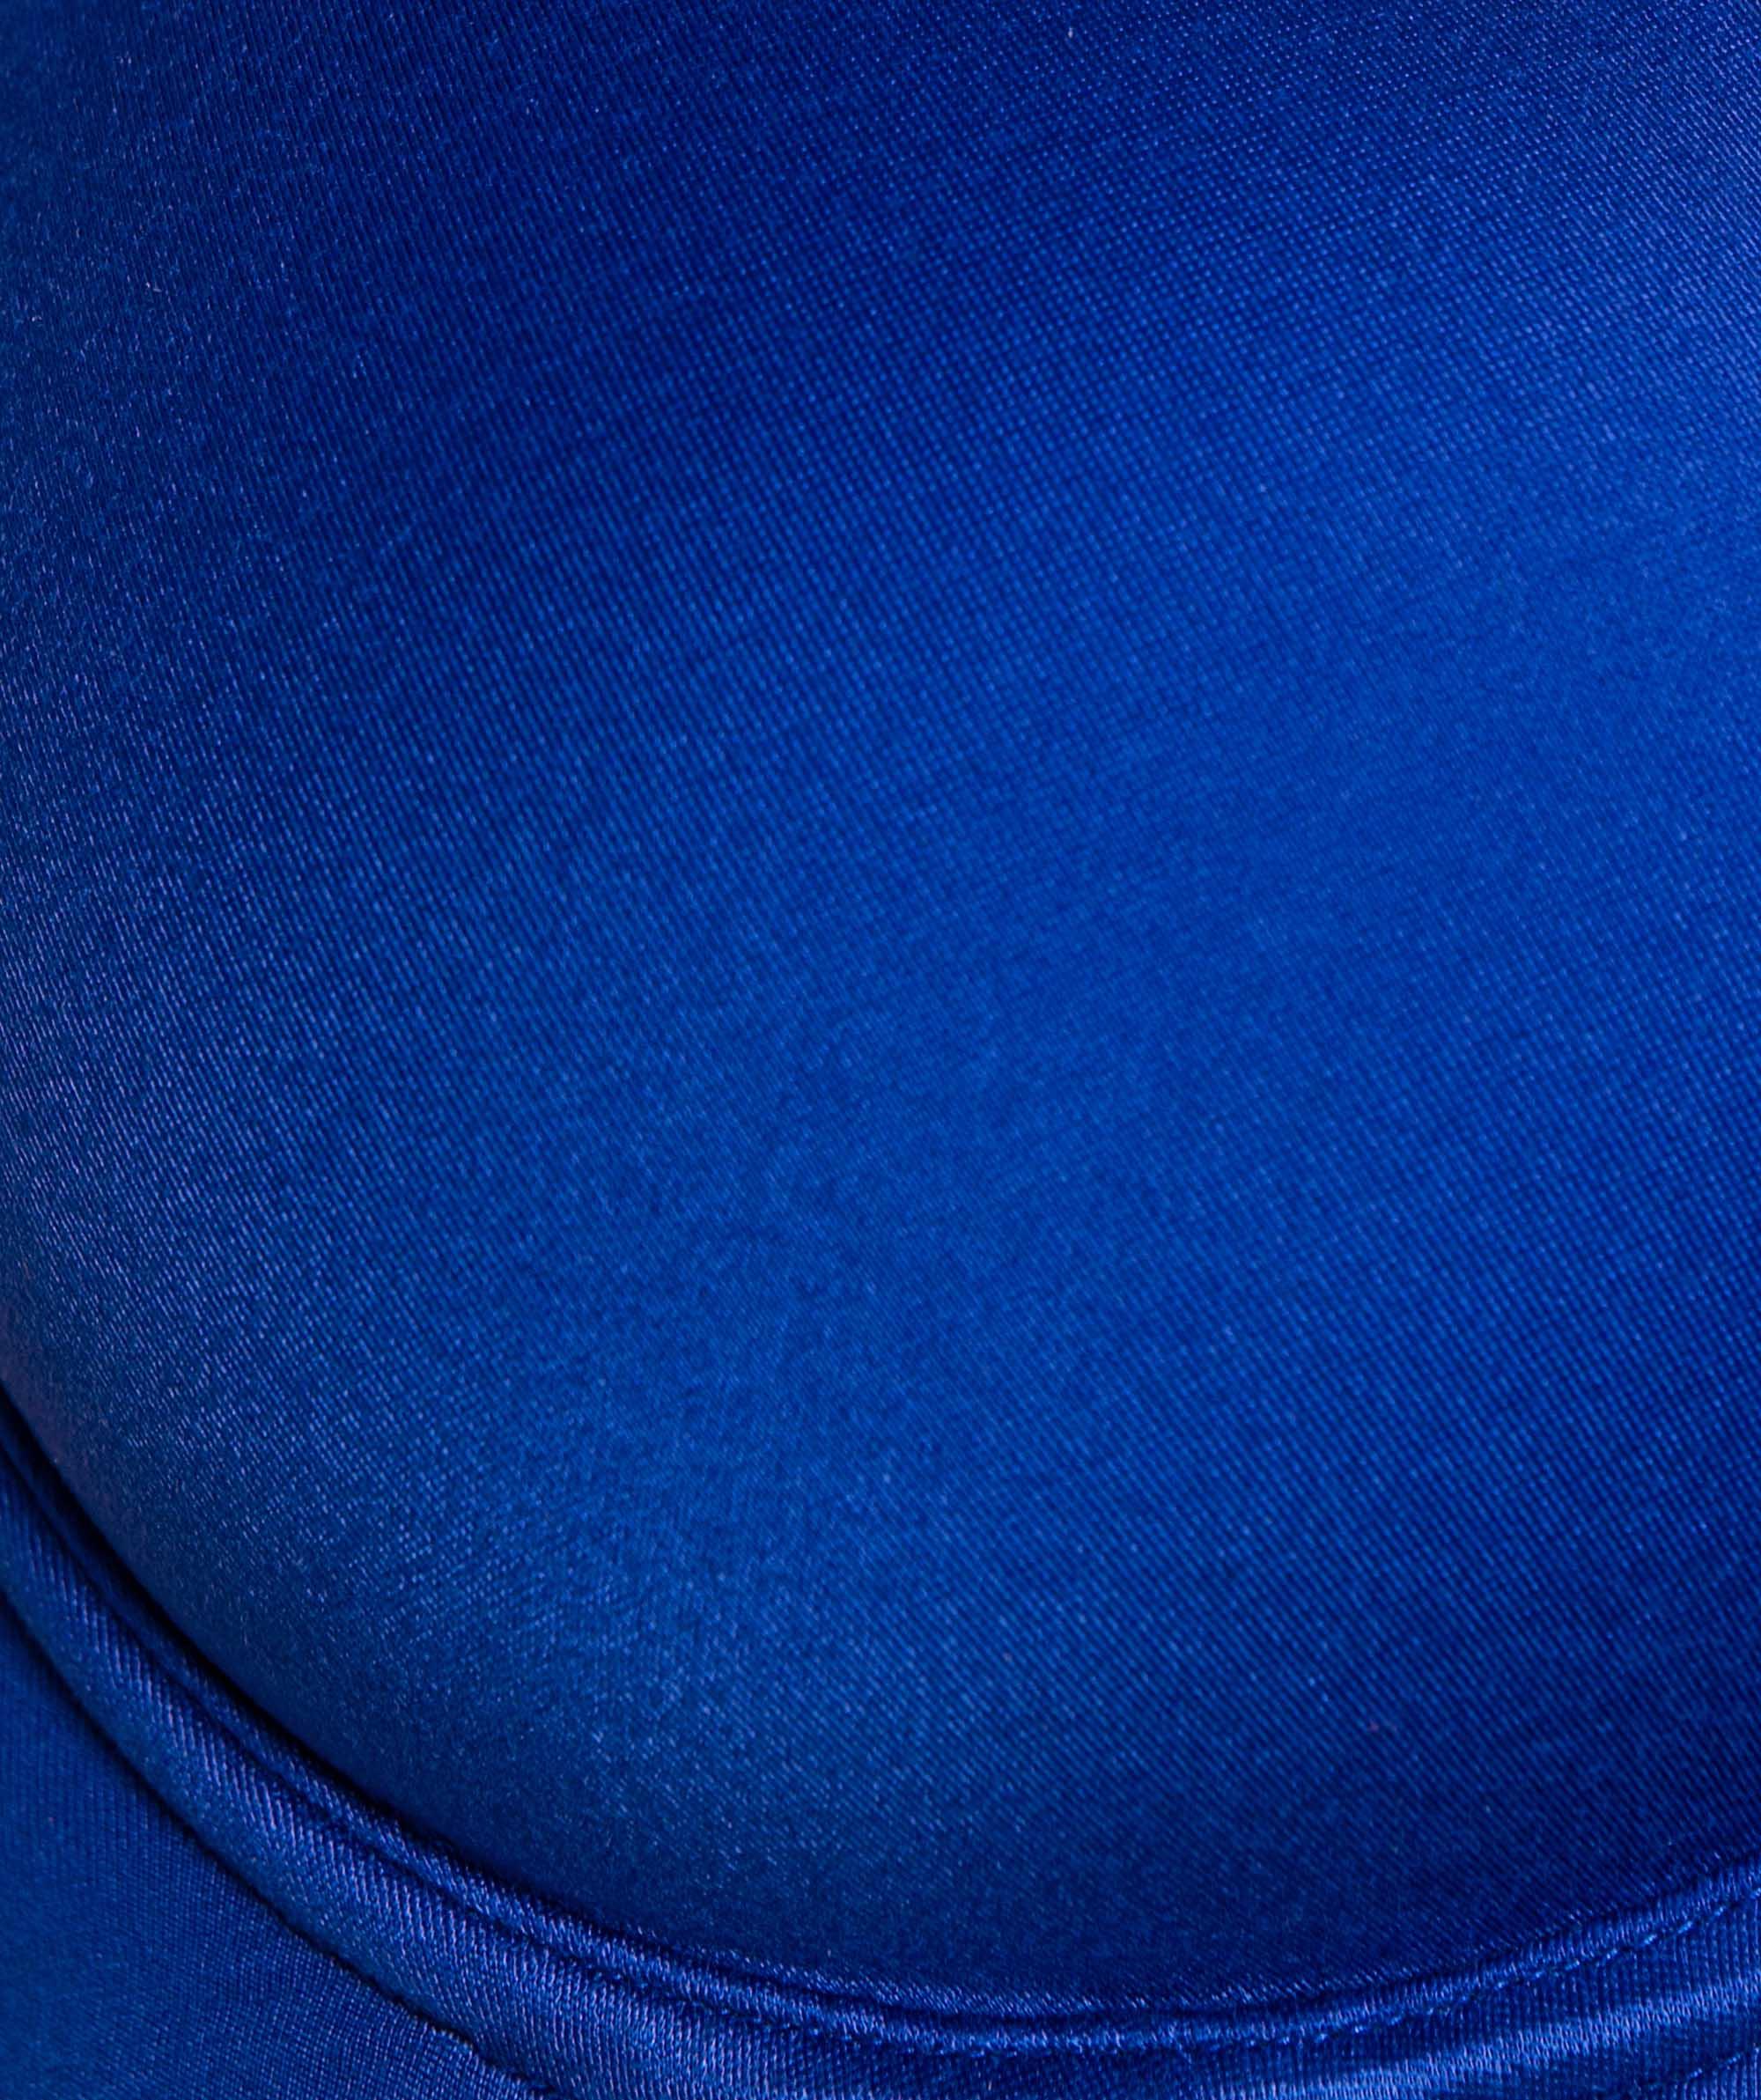 Body Bliss 2nd Gen Contour Bra - Dark Blue